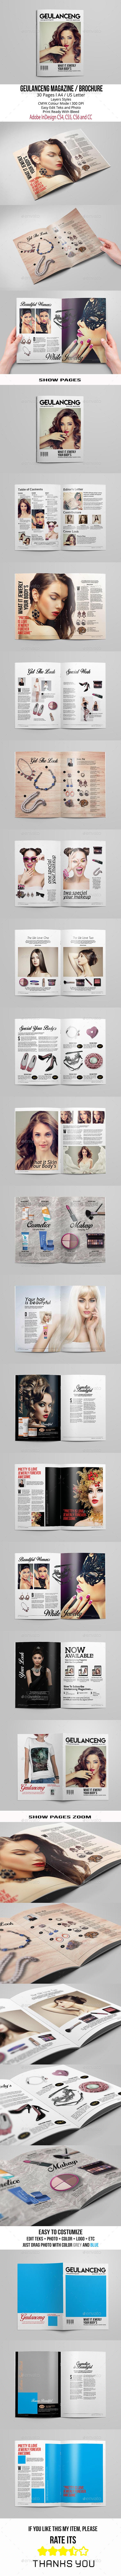 Geulanceng Magazine A4/US Letter - Magazines Print Templates